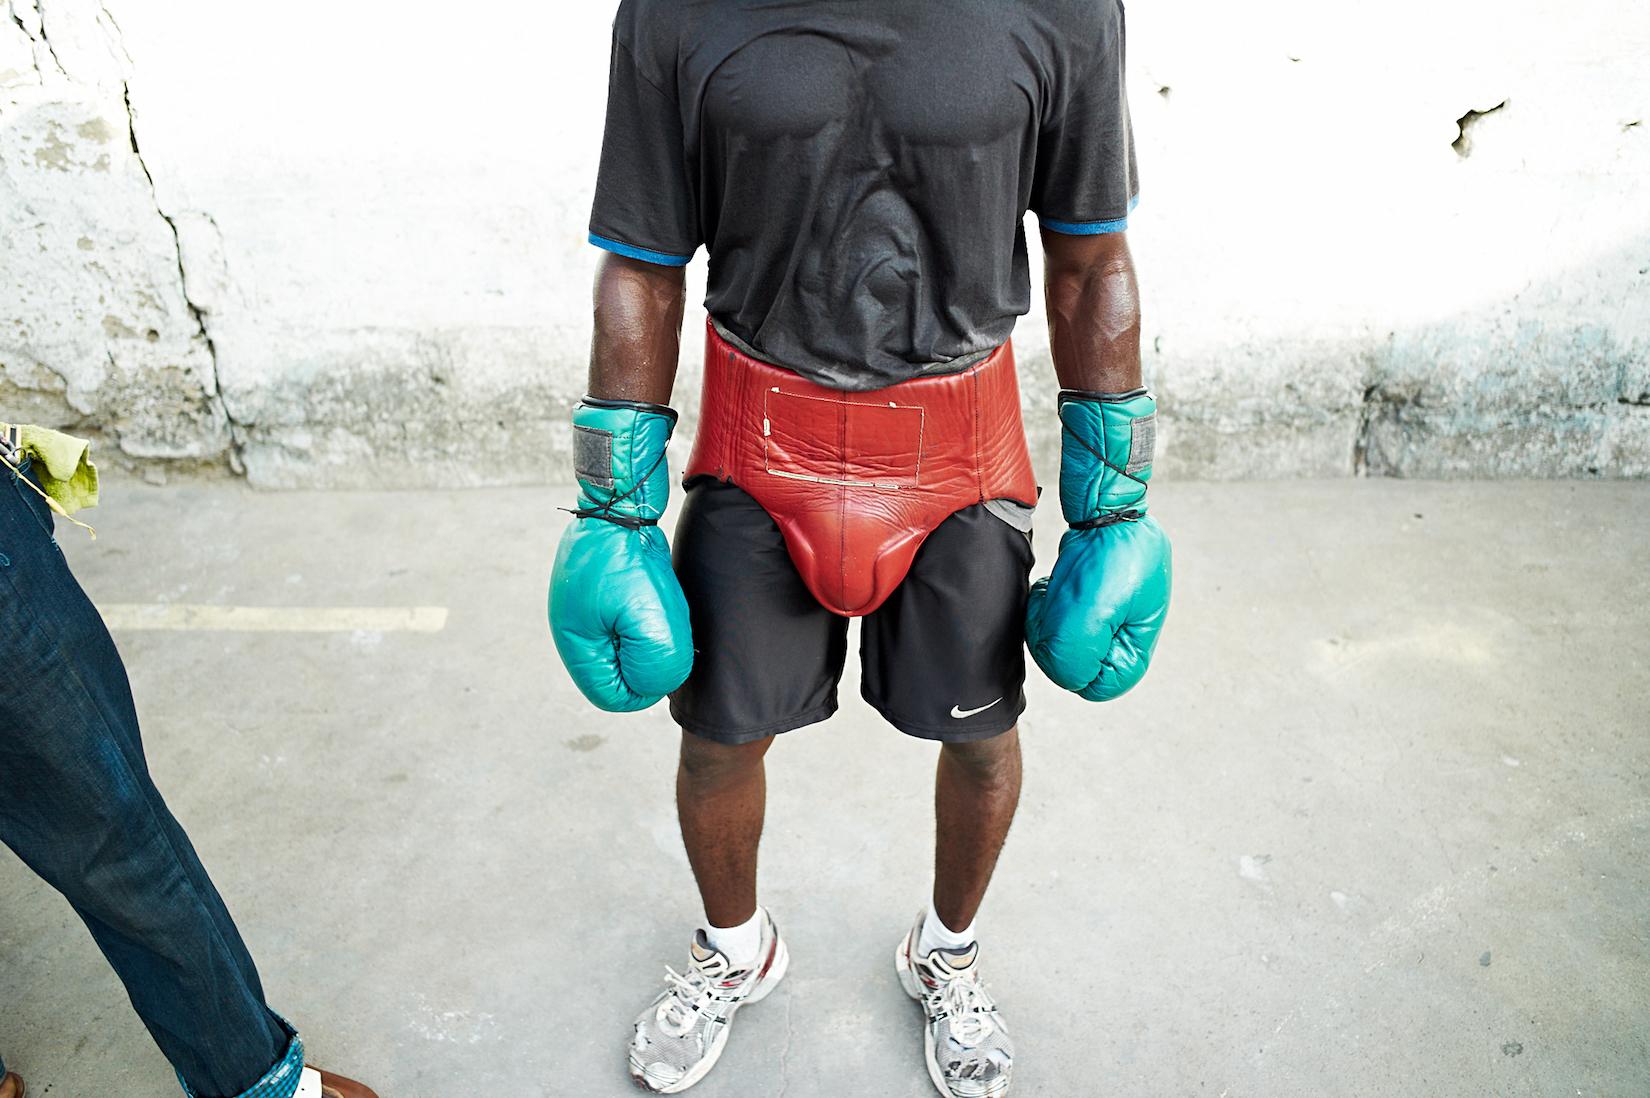 photography_boxersinghana_andreasjakwerth_02